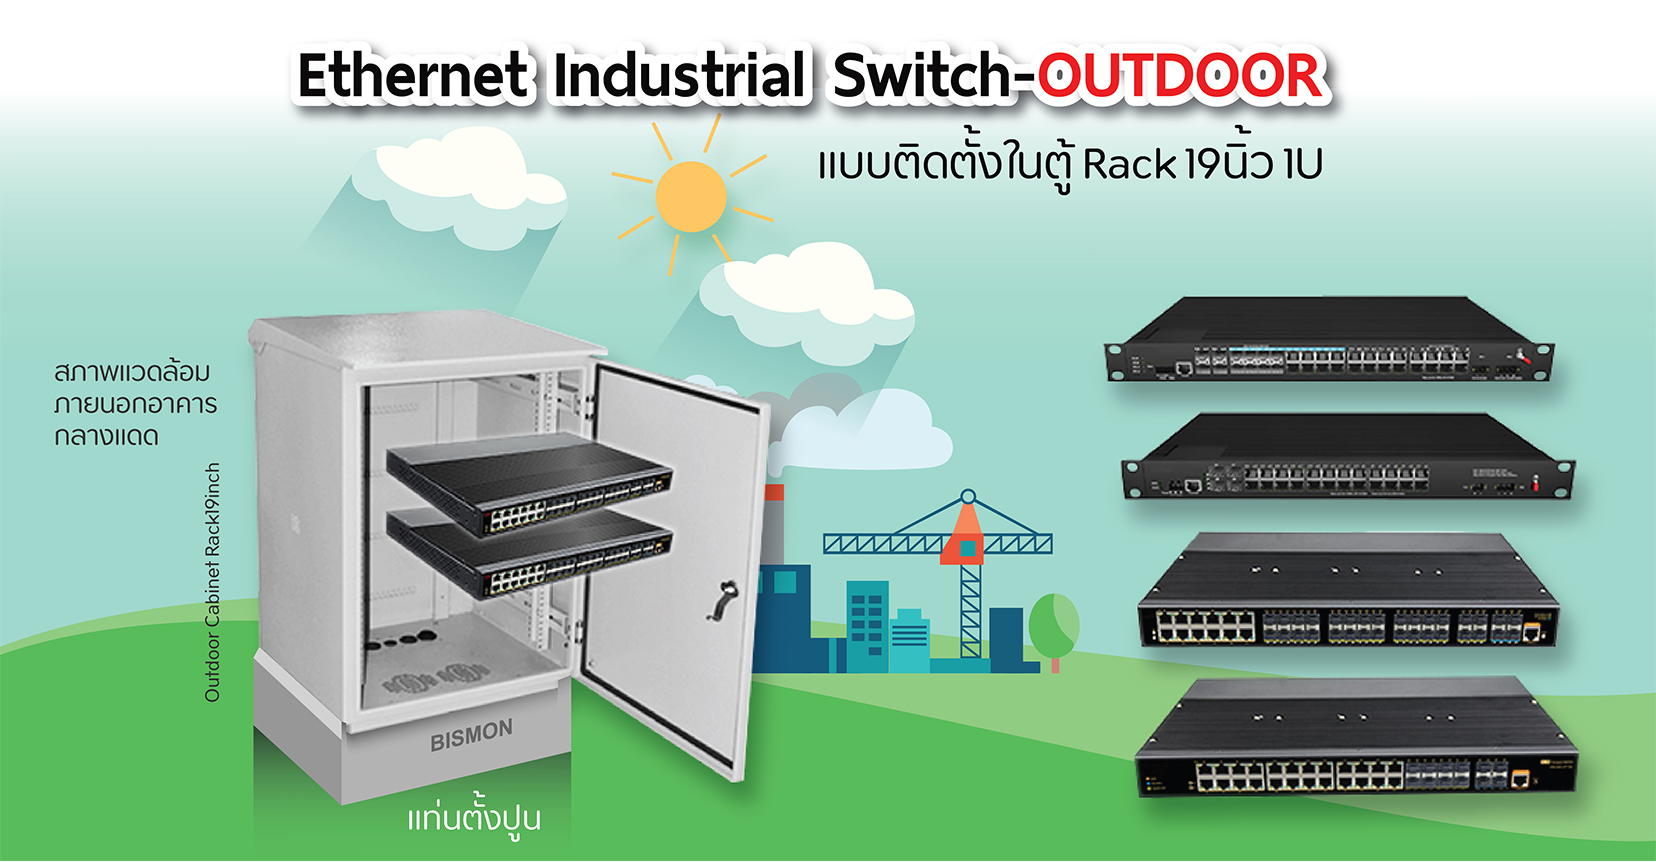 19 inch Industrial Ethernet Rackmount Switches แบบใช้งานภายนอกอาคาร(Outdoor)